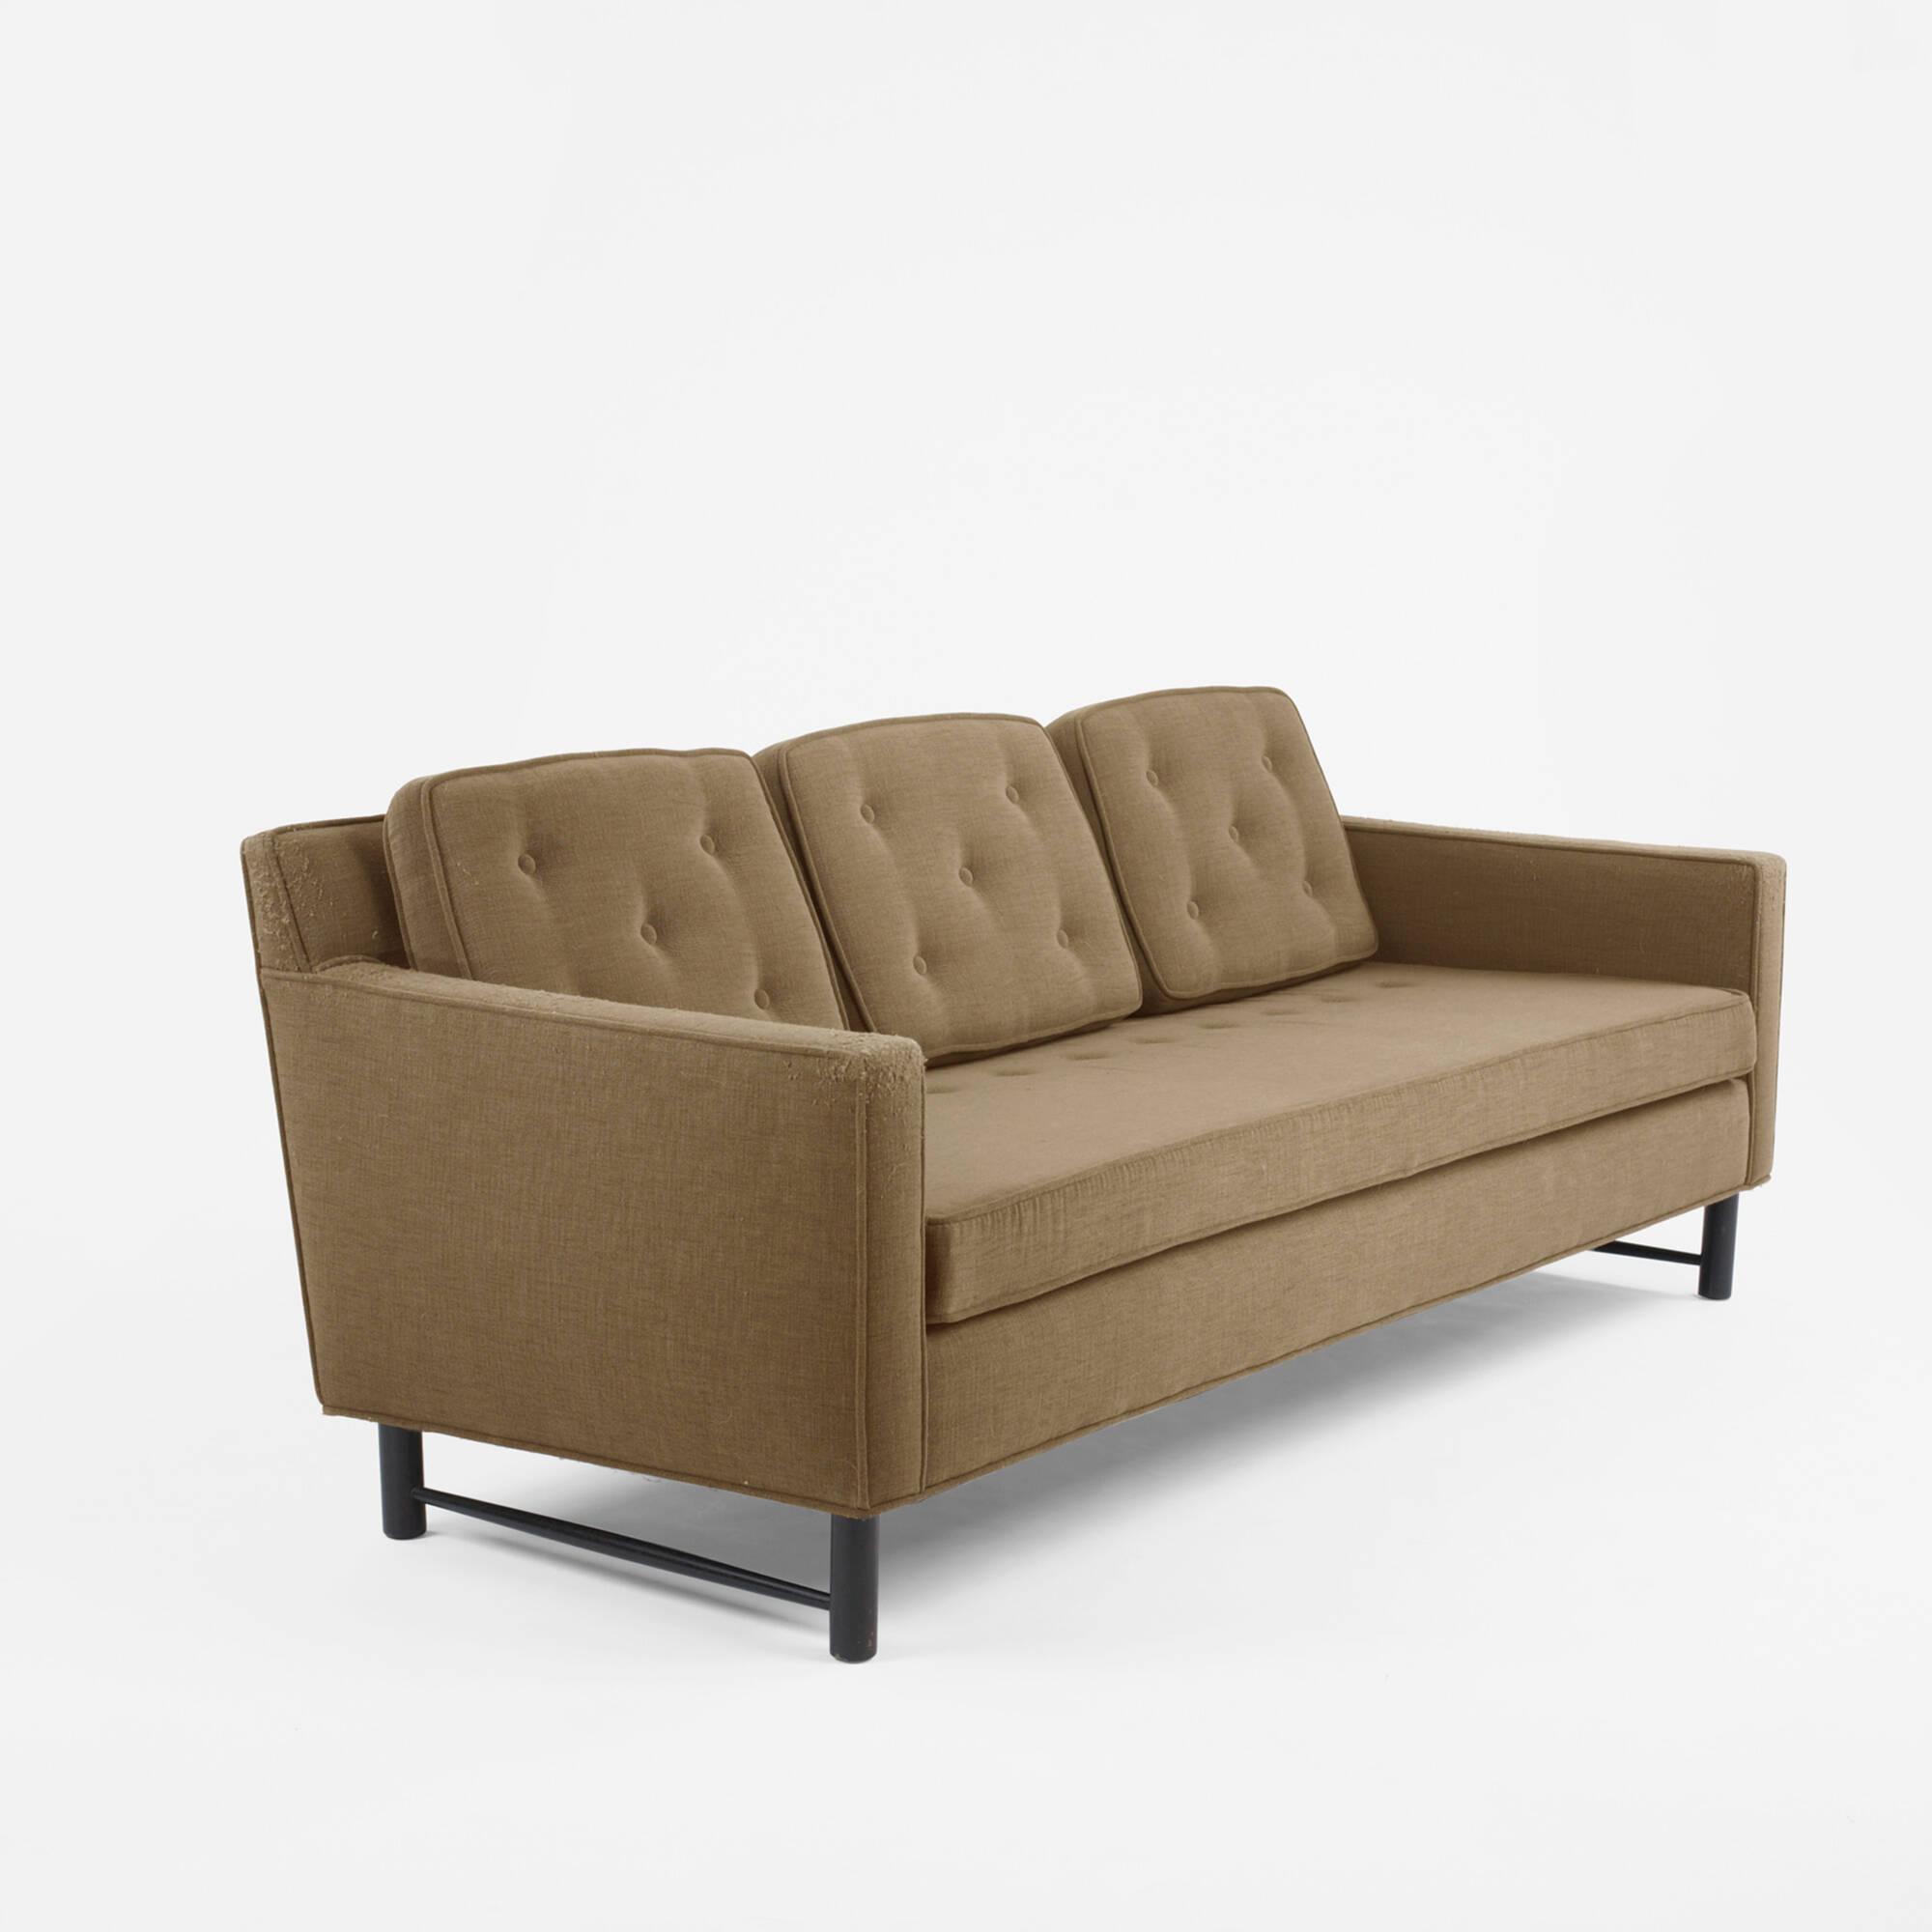 281: EDWARD WORMLEY, Sofa U003c Modern Design, 6 October 2009 U003c Auctions |  Wright: Auctions Of Art And Design